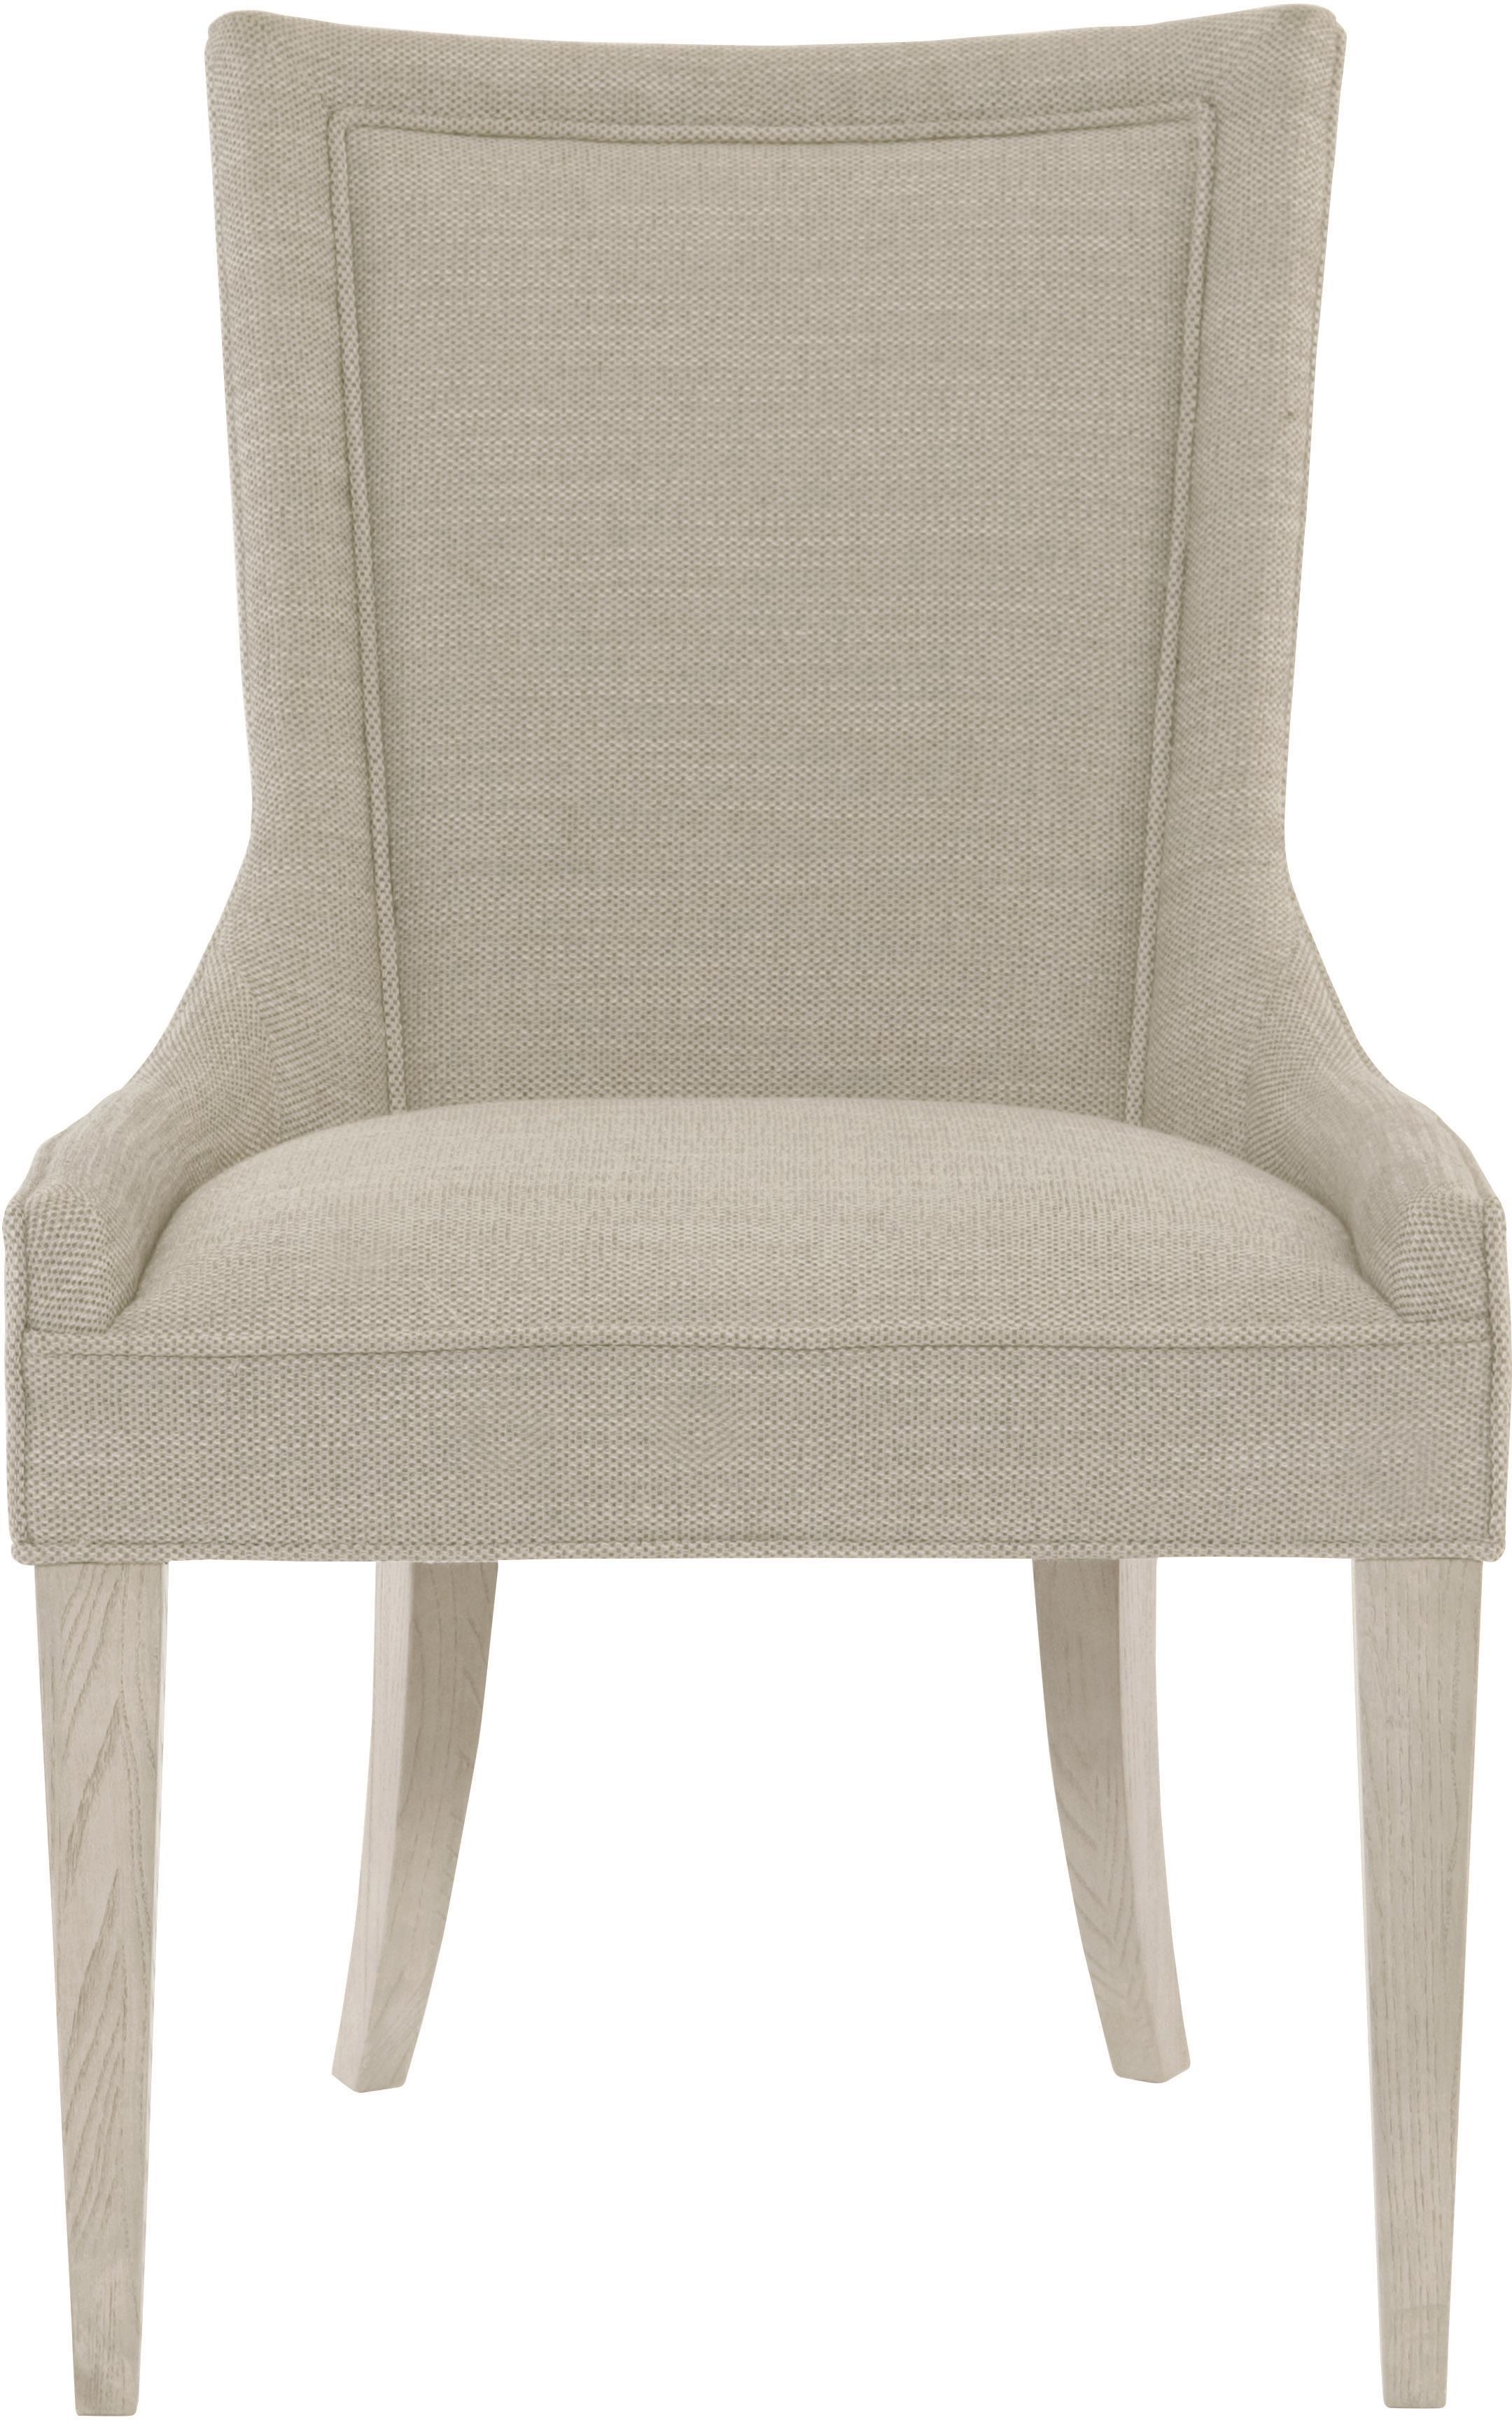 Criteria Arm Chair by Bernhardt at Baer's Furniture